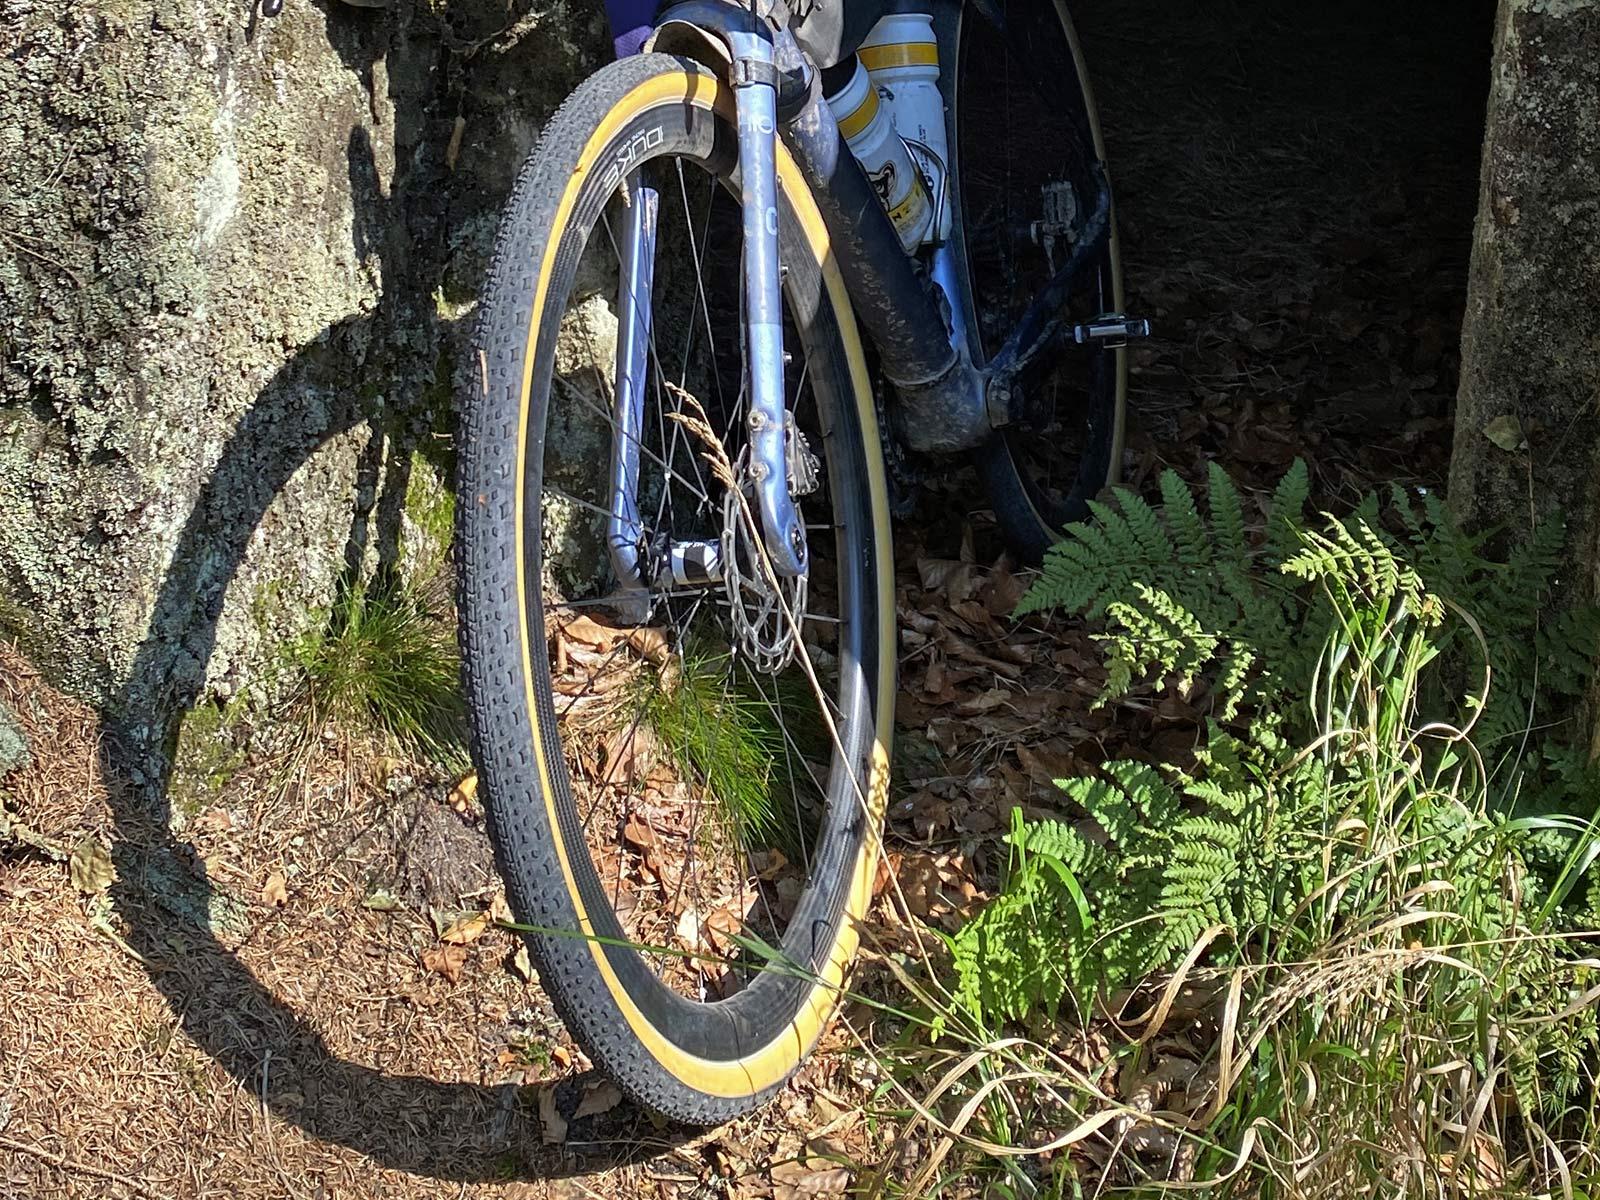 Challenge Getaway gravel bike tires, handmade tubeless tubular H-TLTU, riding